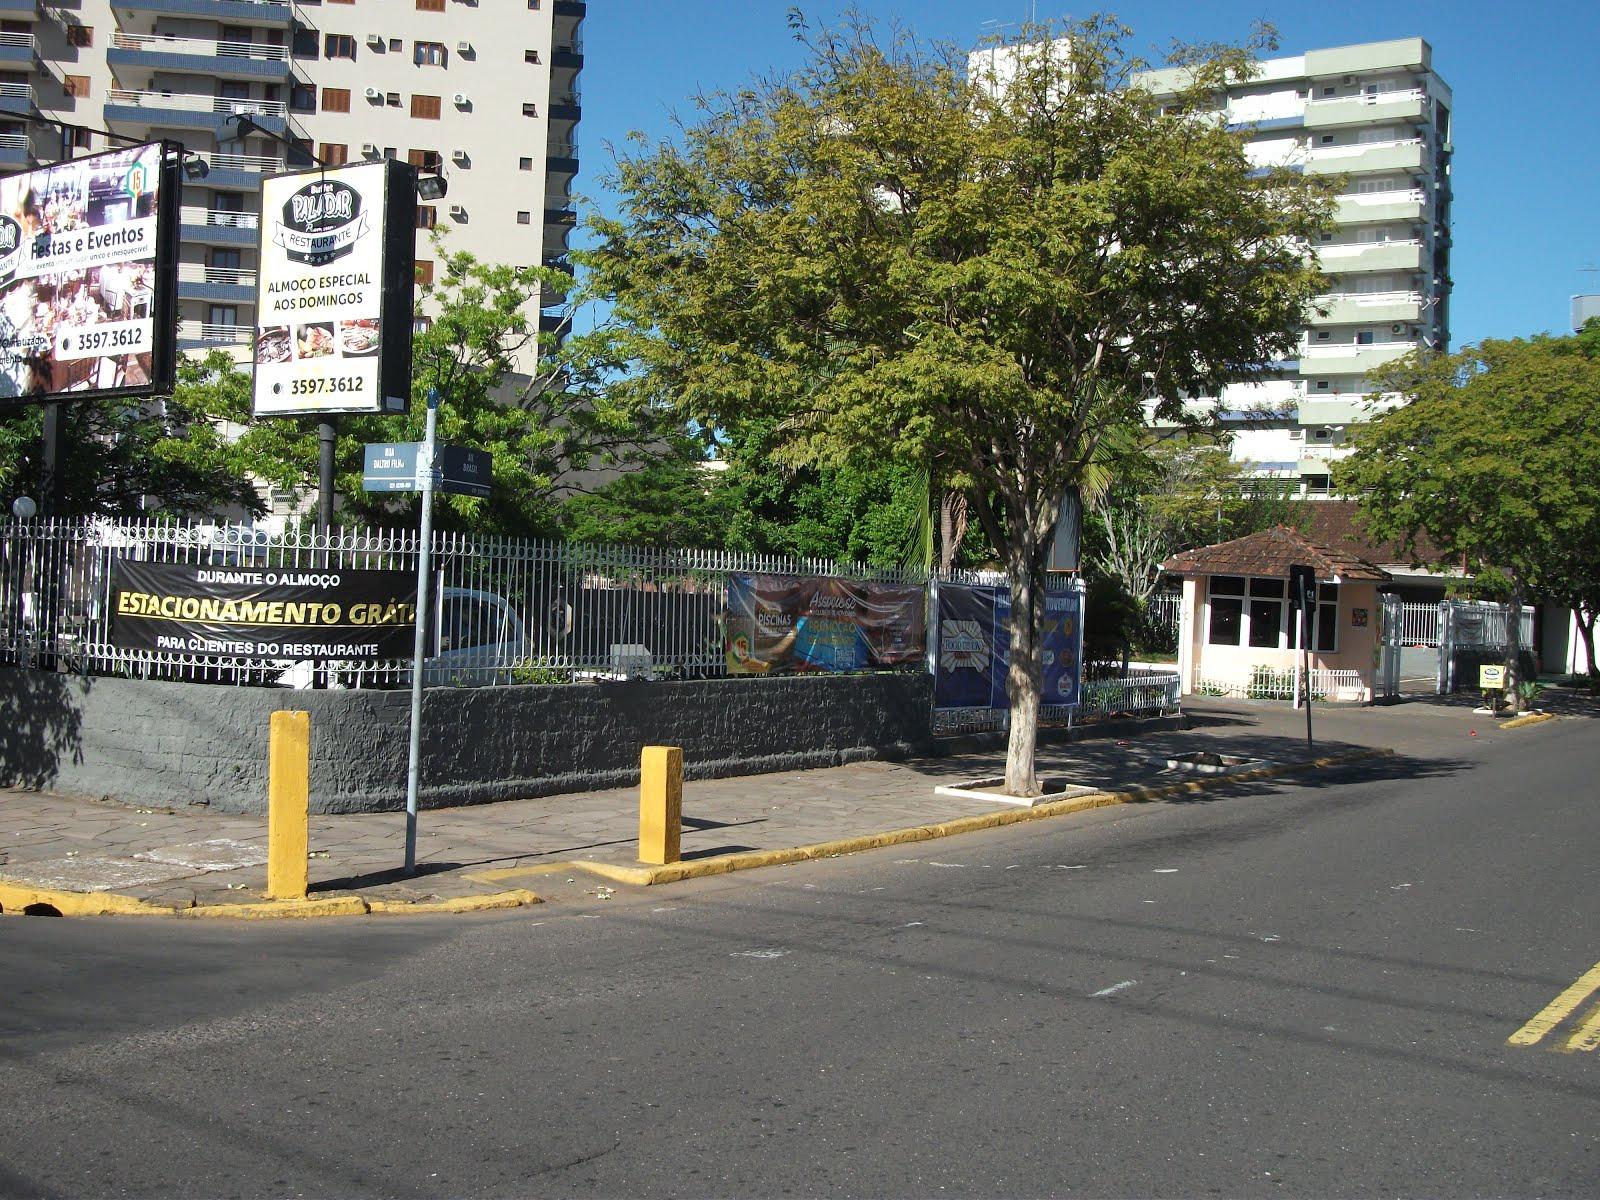 JAIR WINGERT SOLICITA PARADA DE ÔNIBUS NA BRASIL